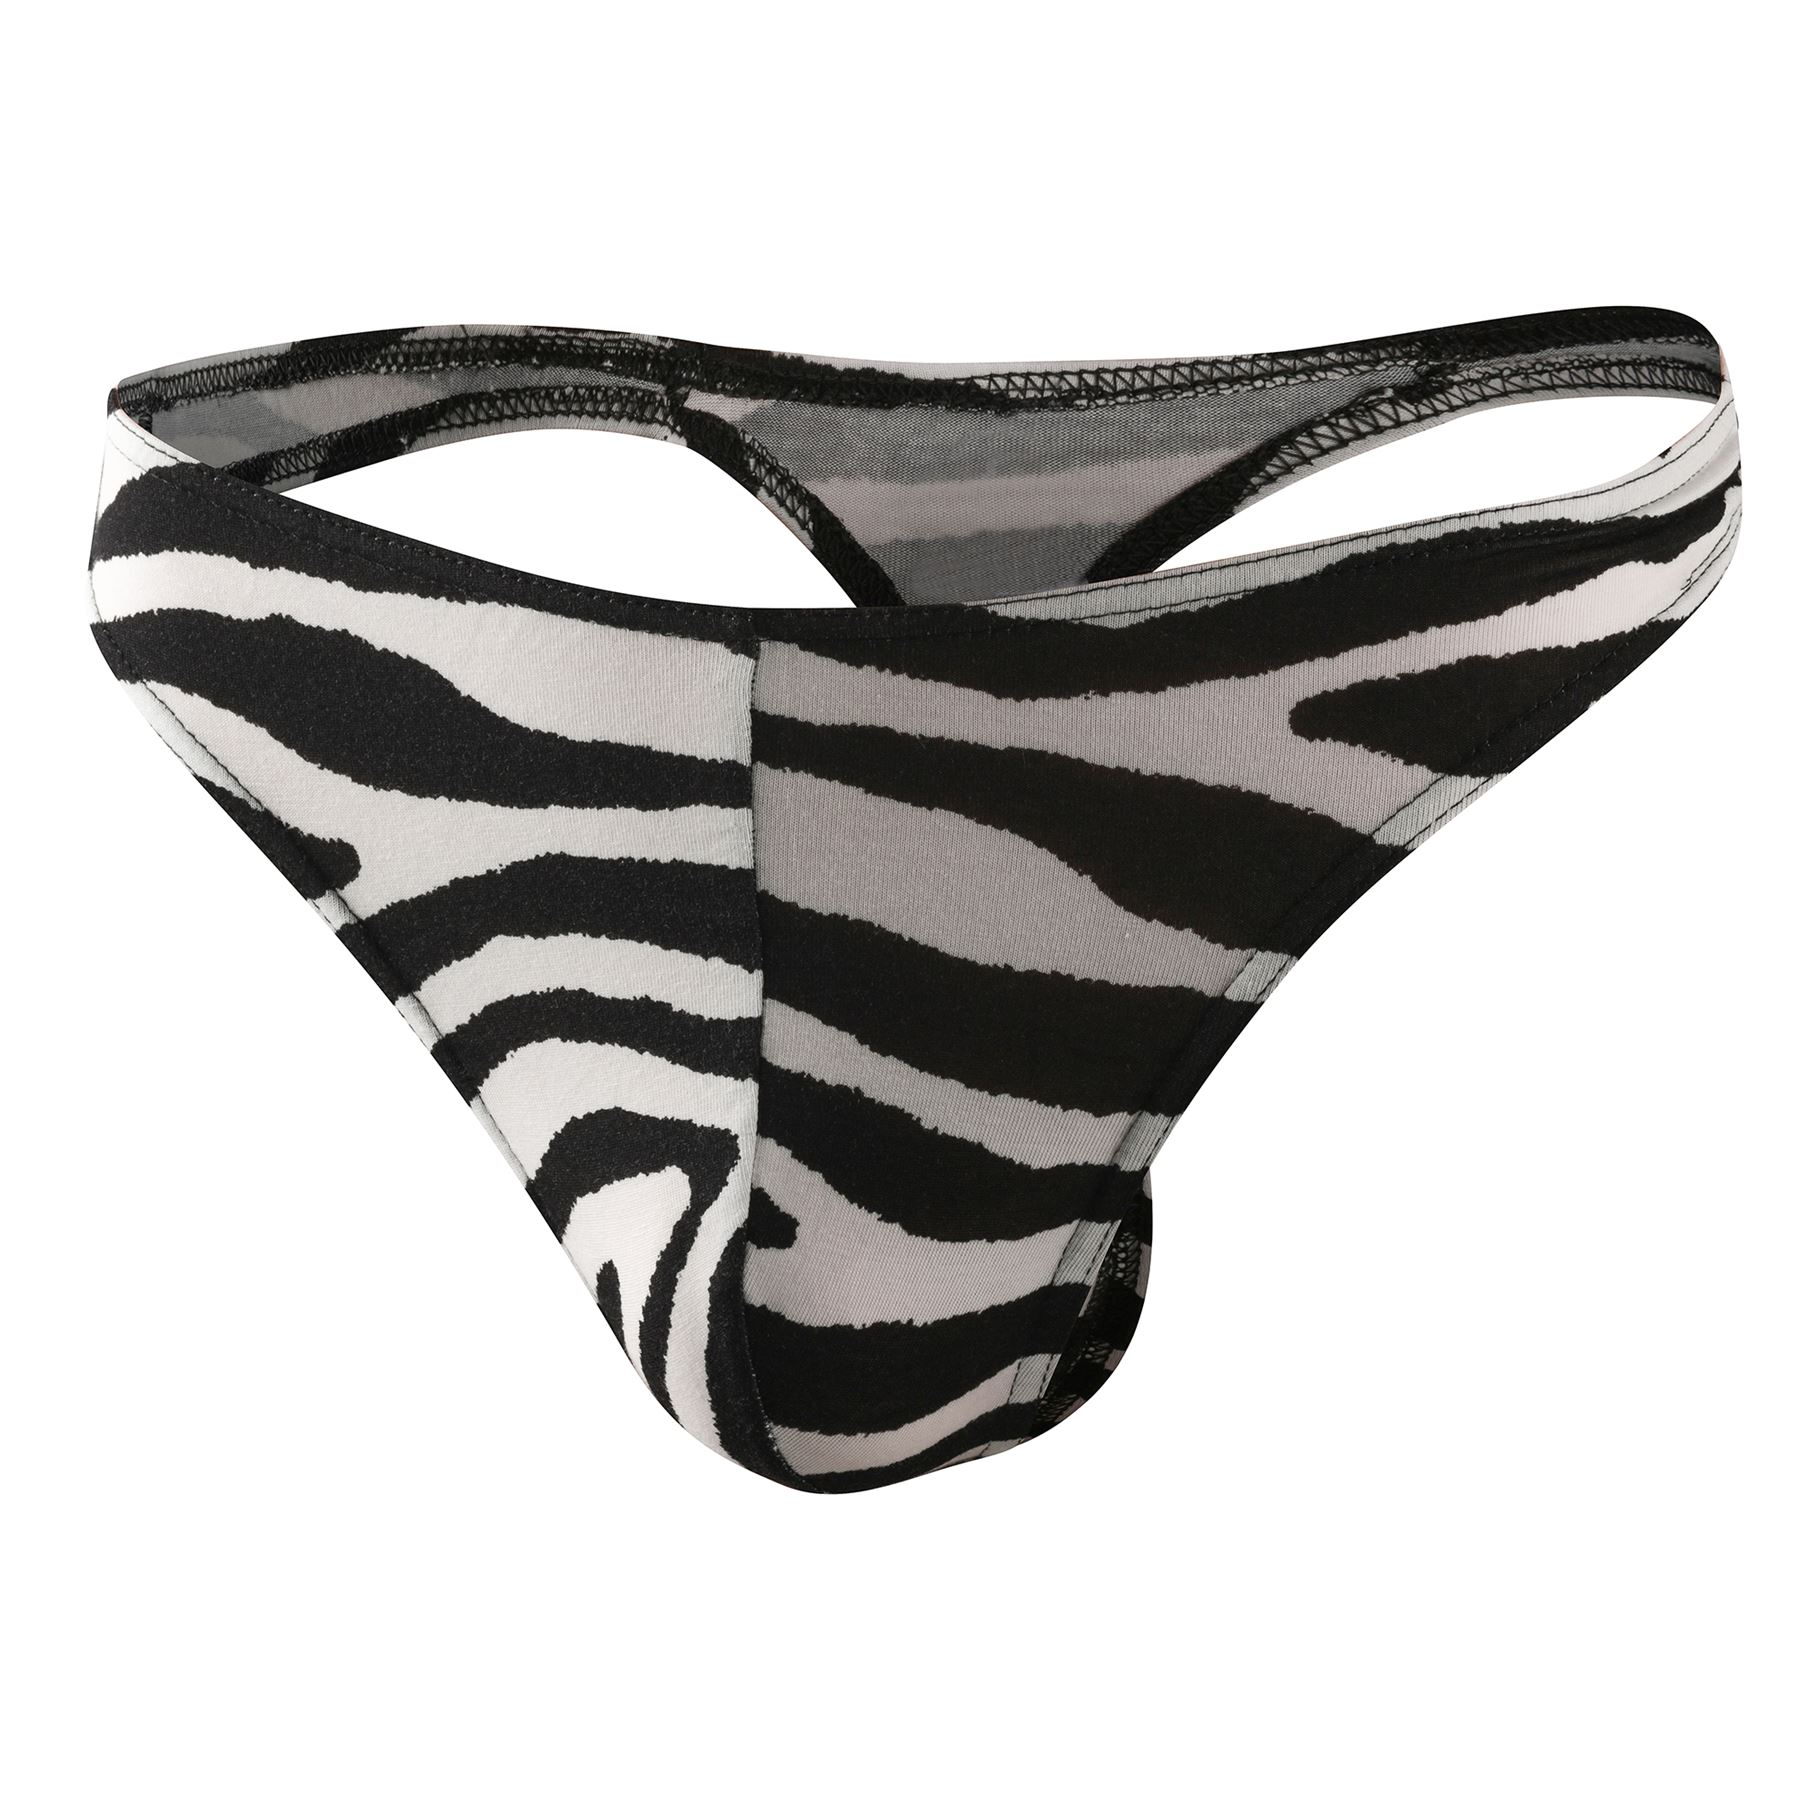 Doreanse 1396 Traveller Thong Mens Underwear